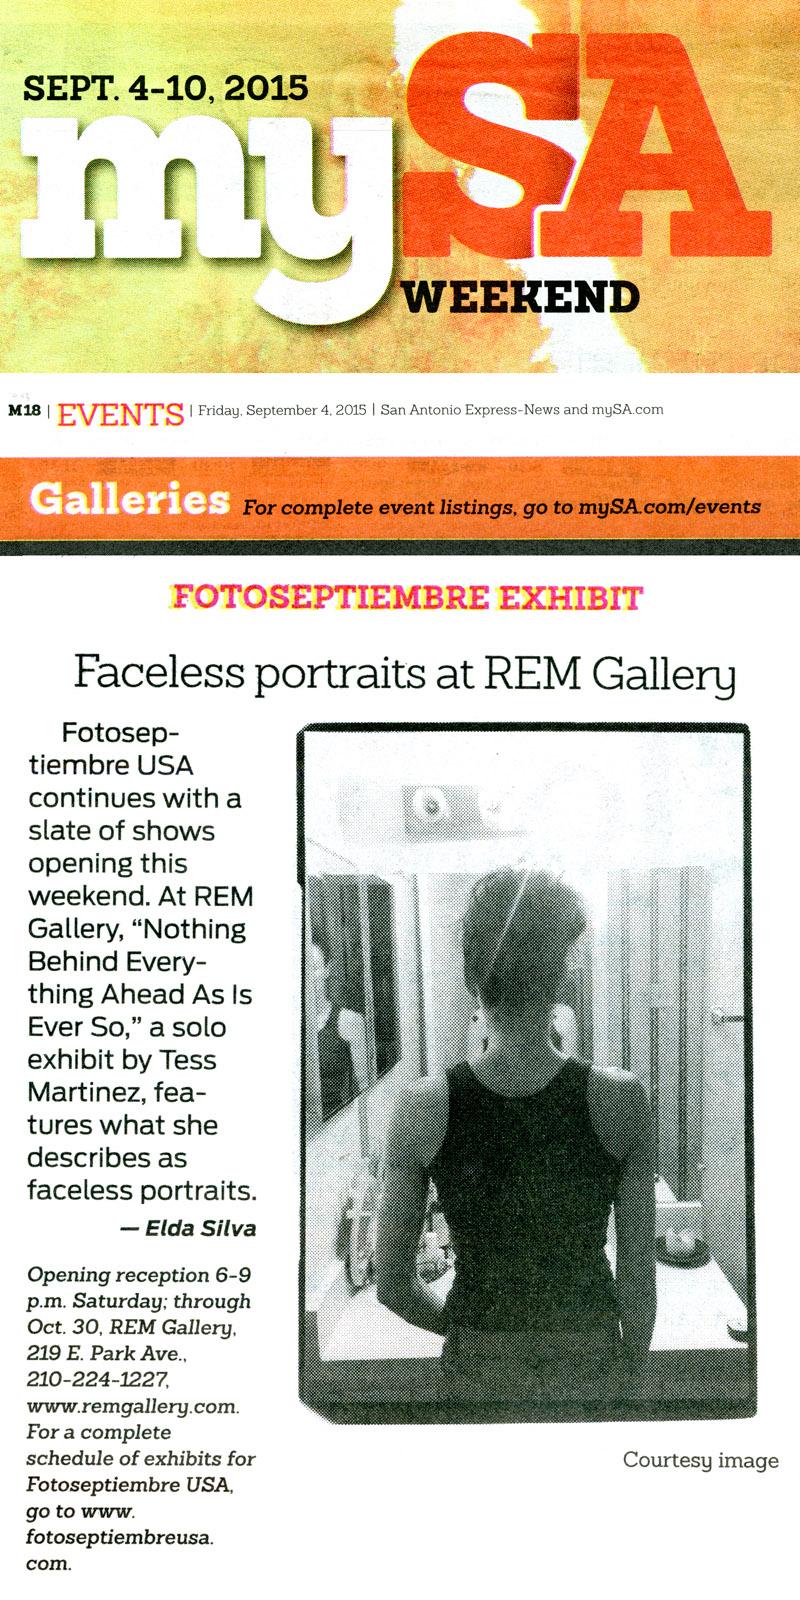 2015-FOTOSEPTIEMBRE-USA_REM-Gallery_MySA-Express-News